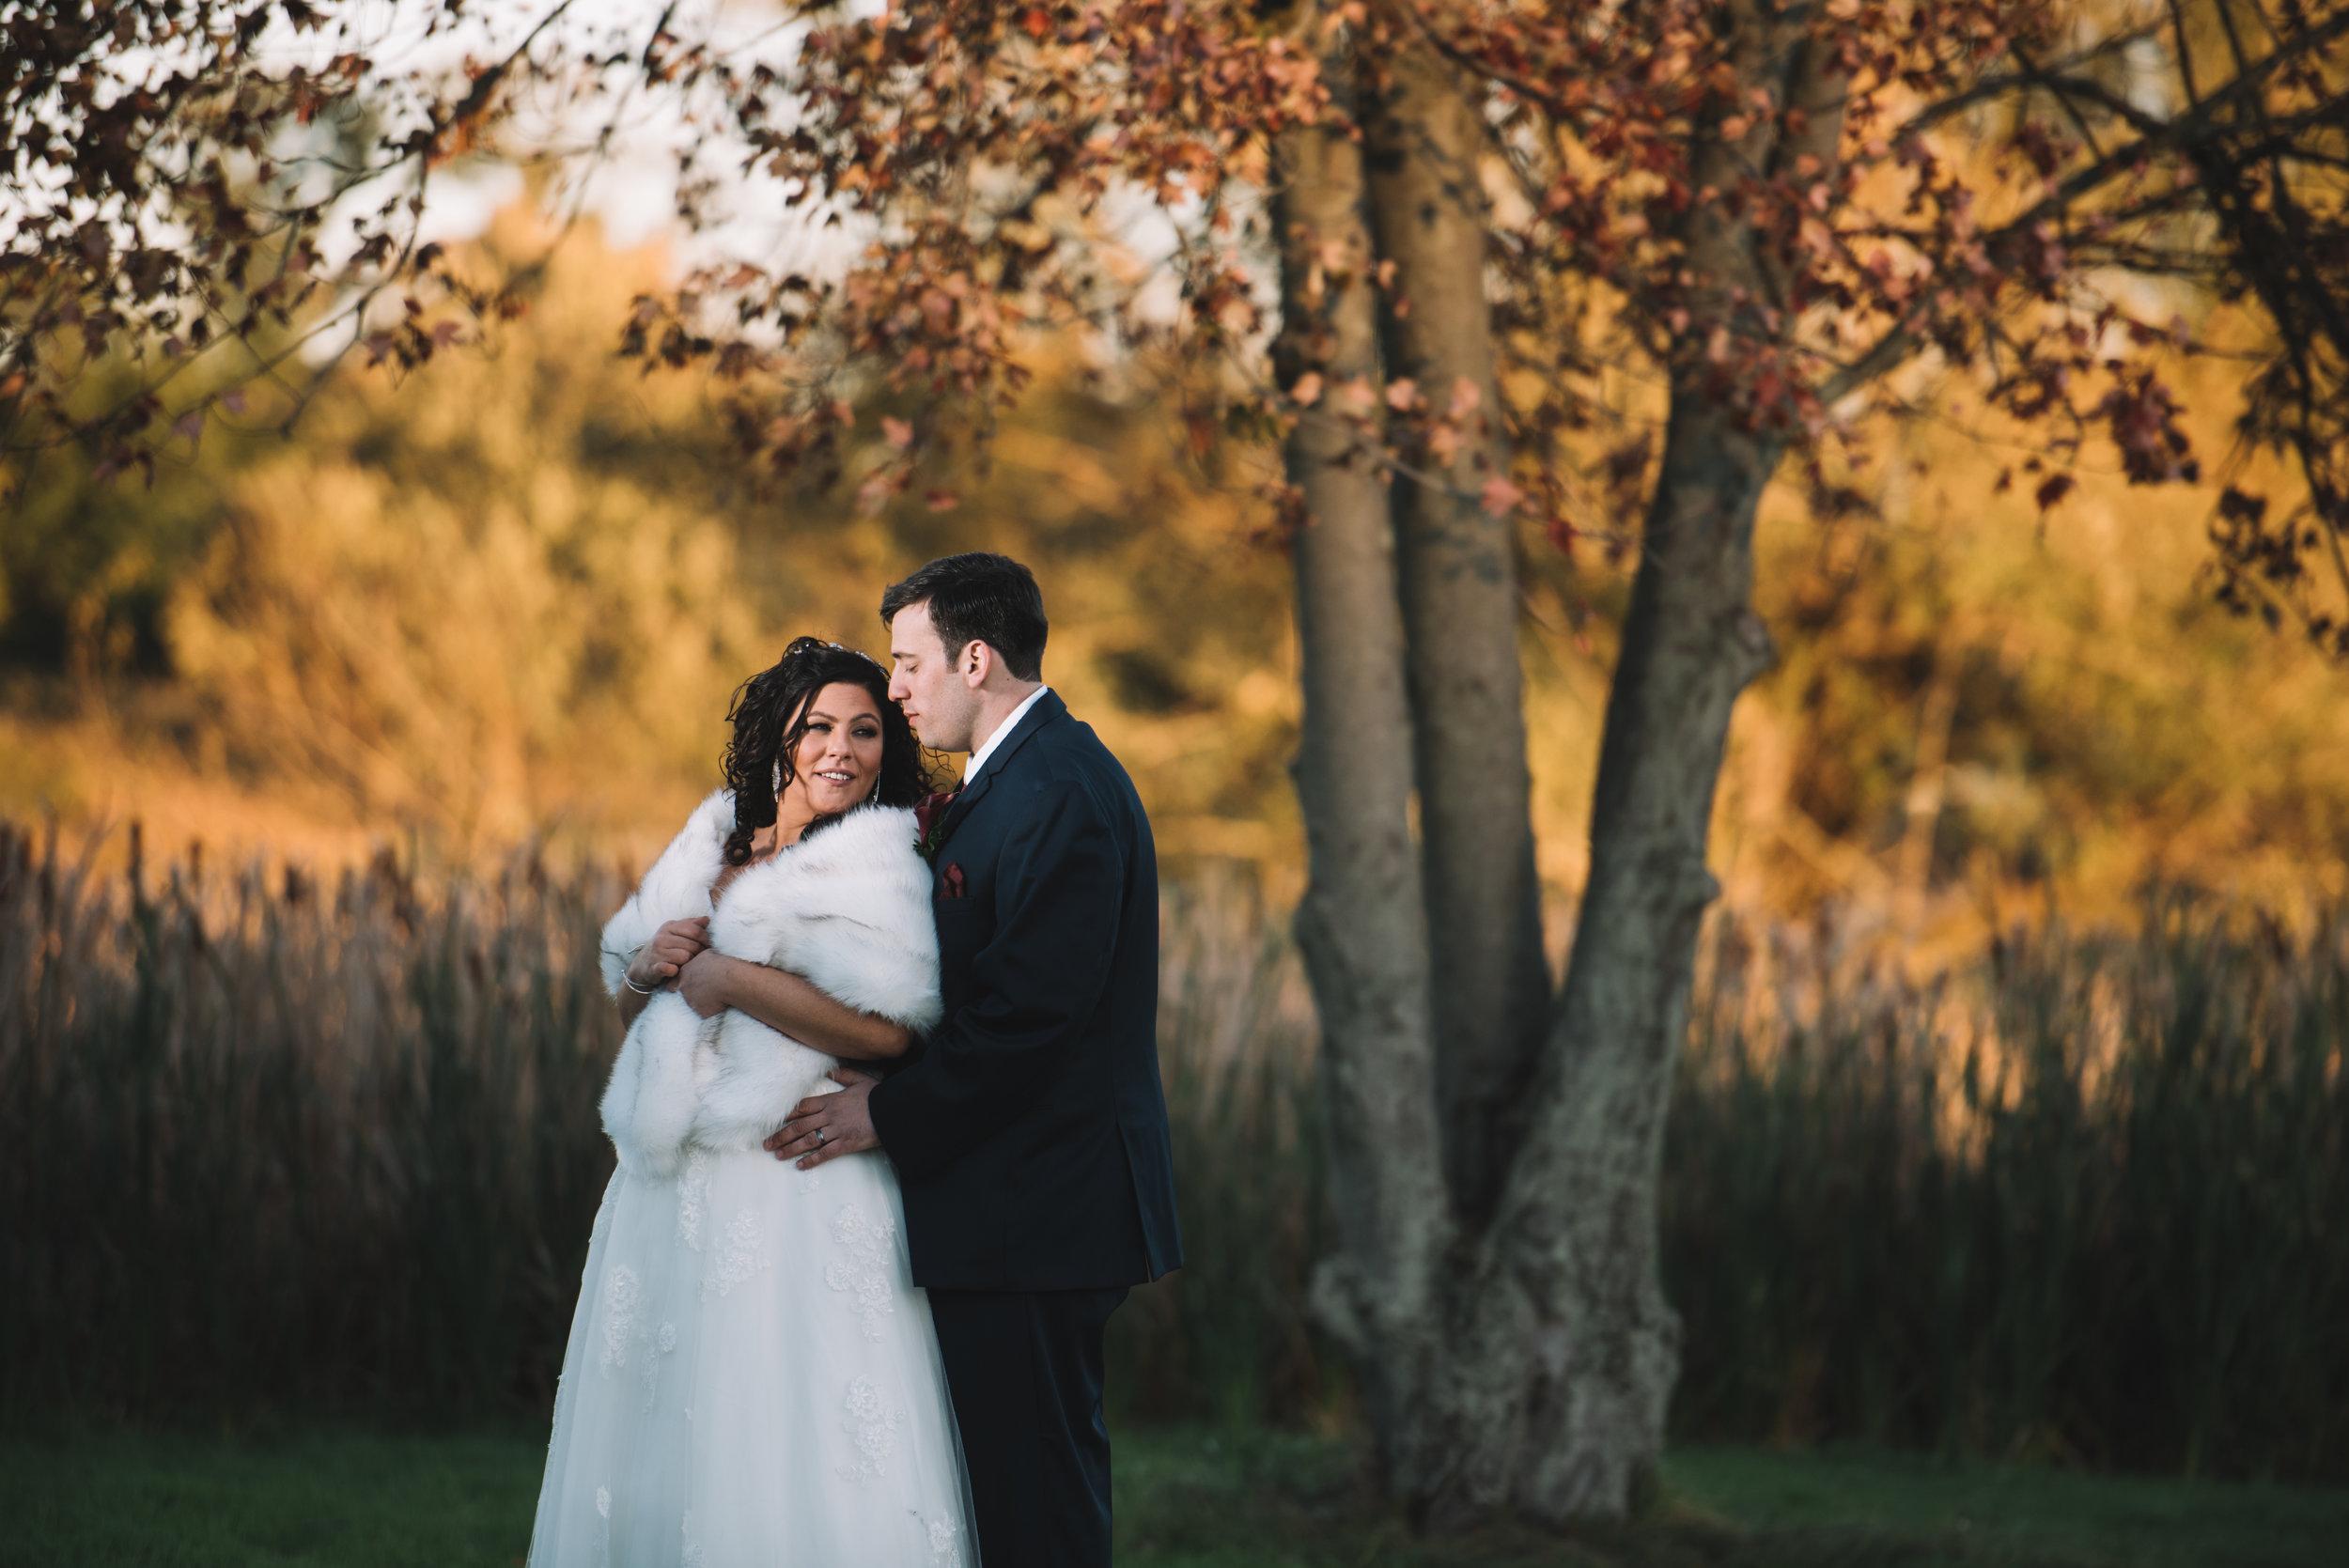 WeddingPhotos | NJPhotographer | Highlights-3-46.jpg